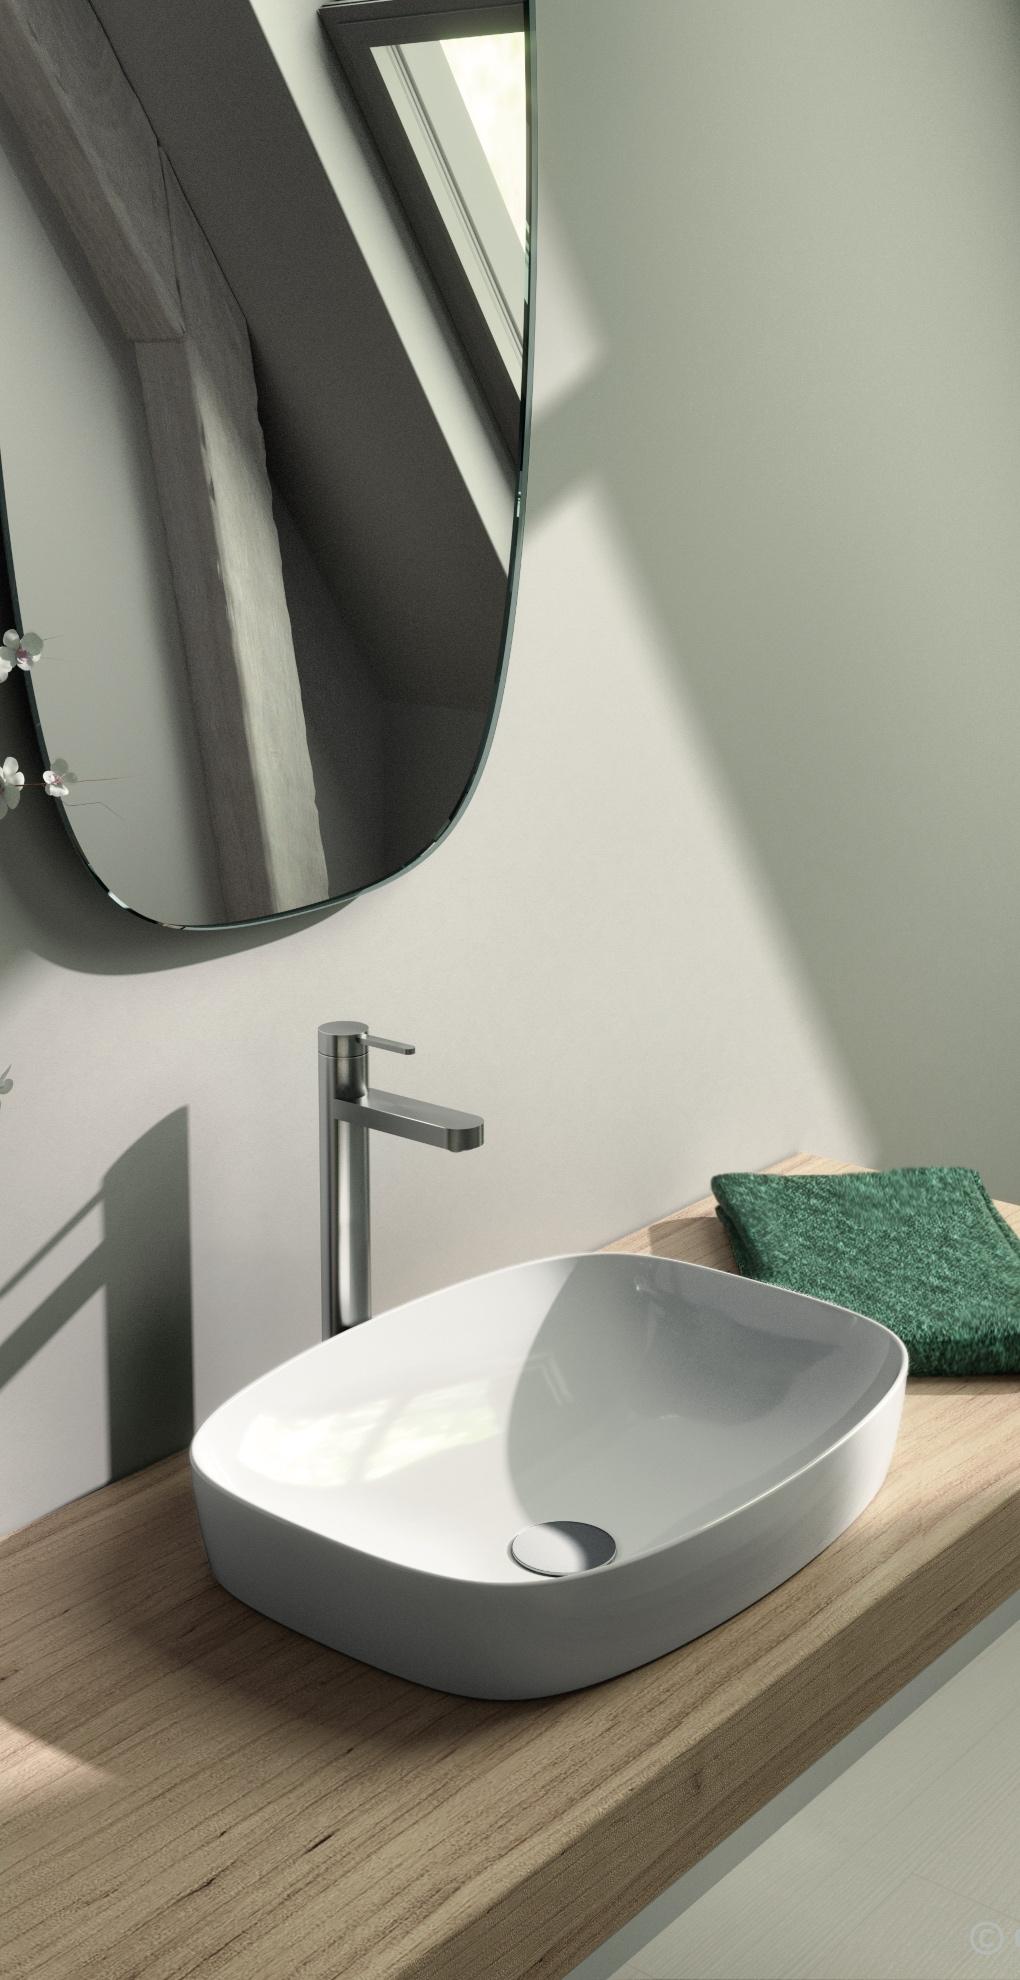 Catalano vask cataglaze hvid GREEN Lux 50x38